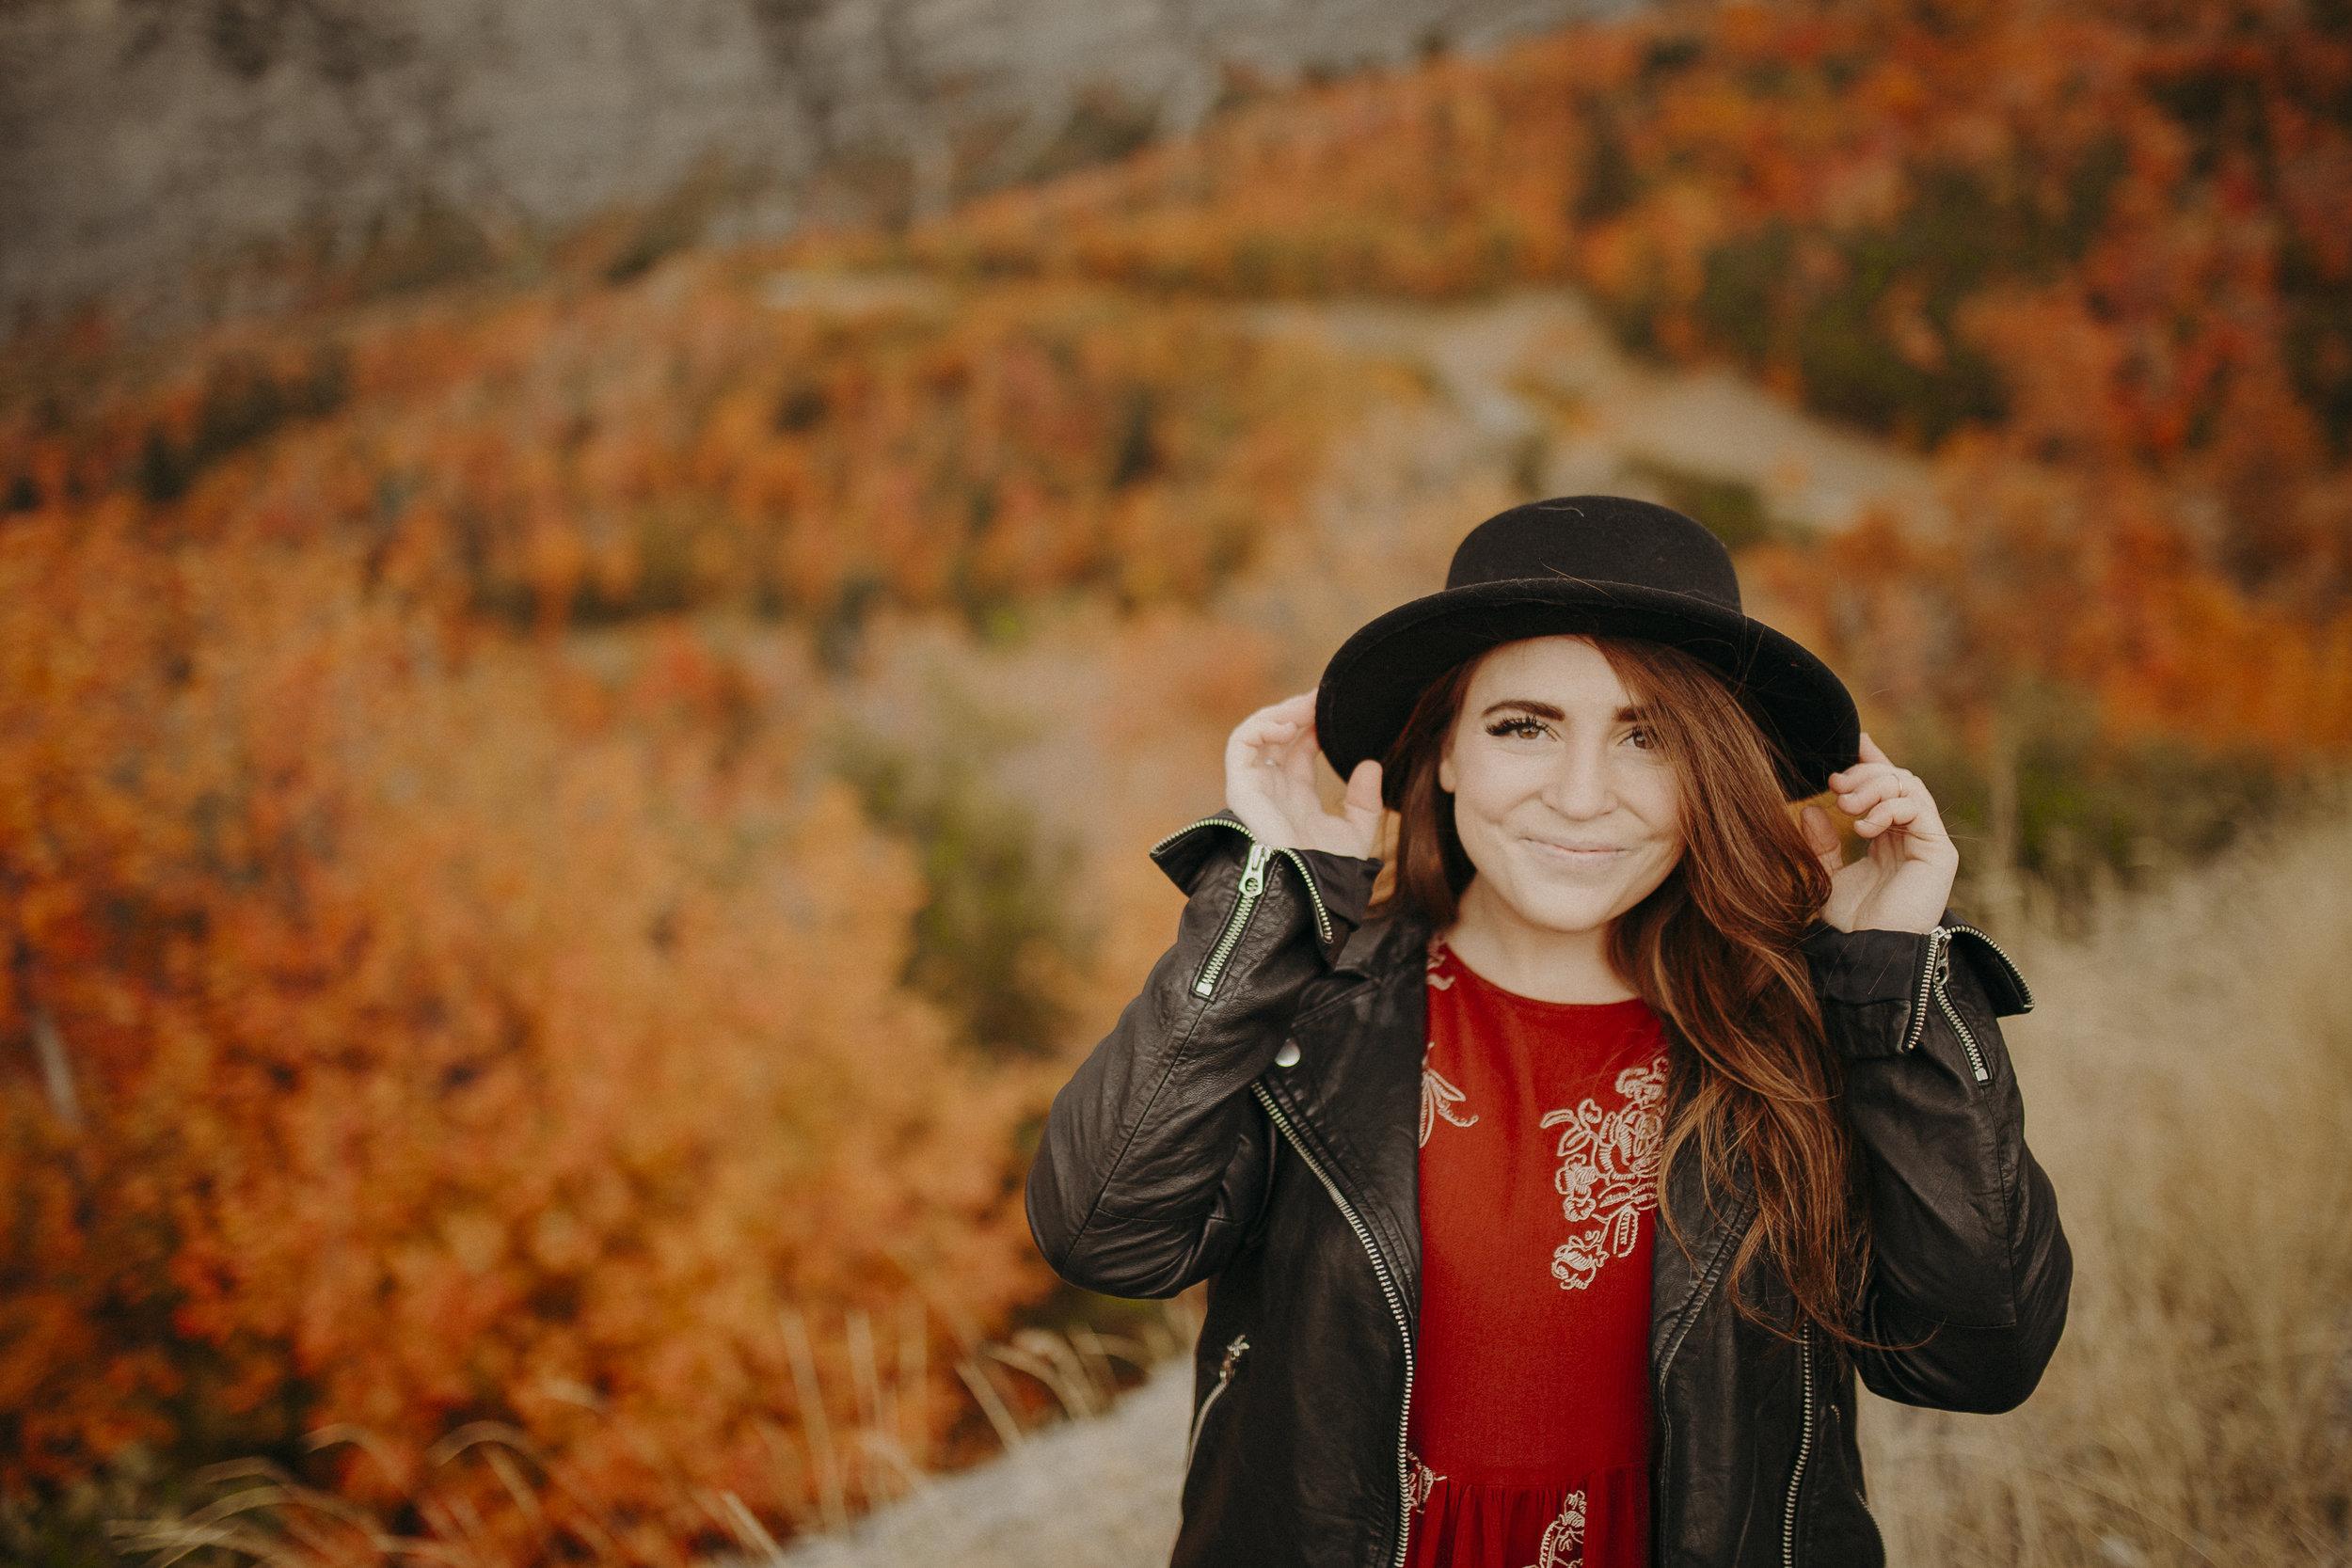 fall-outfit-ideas-11.jpg